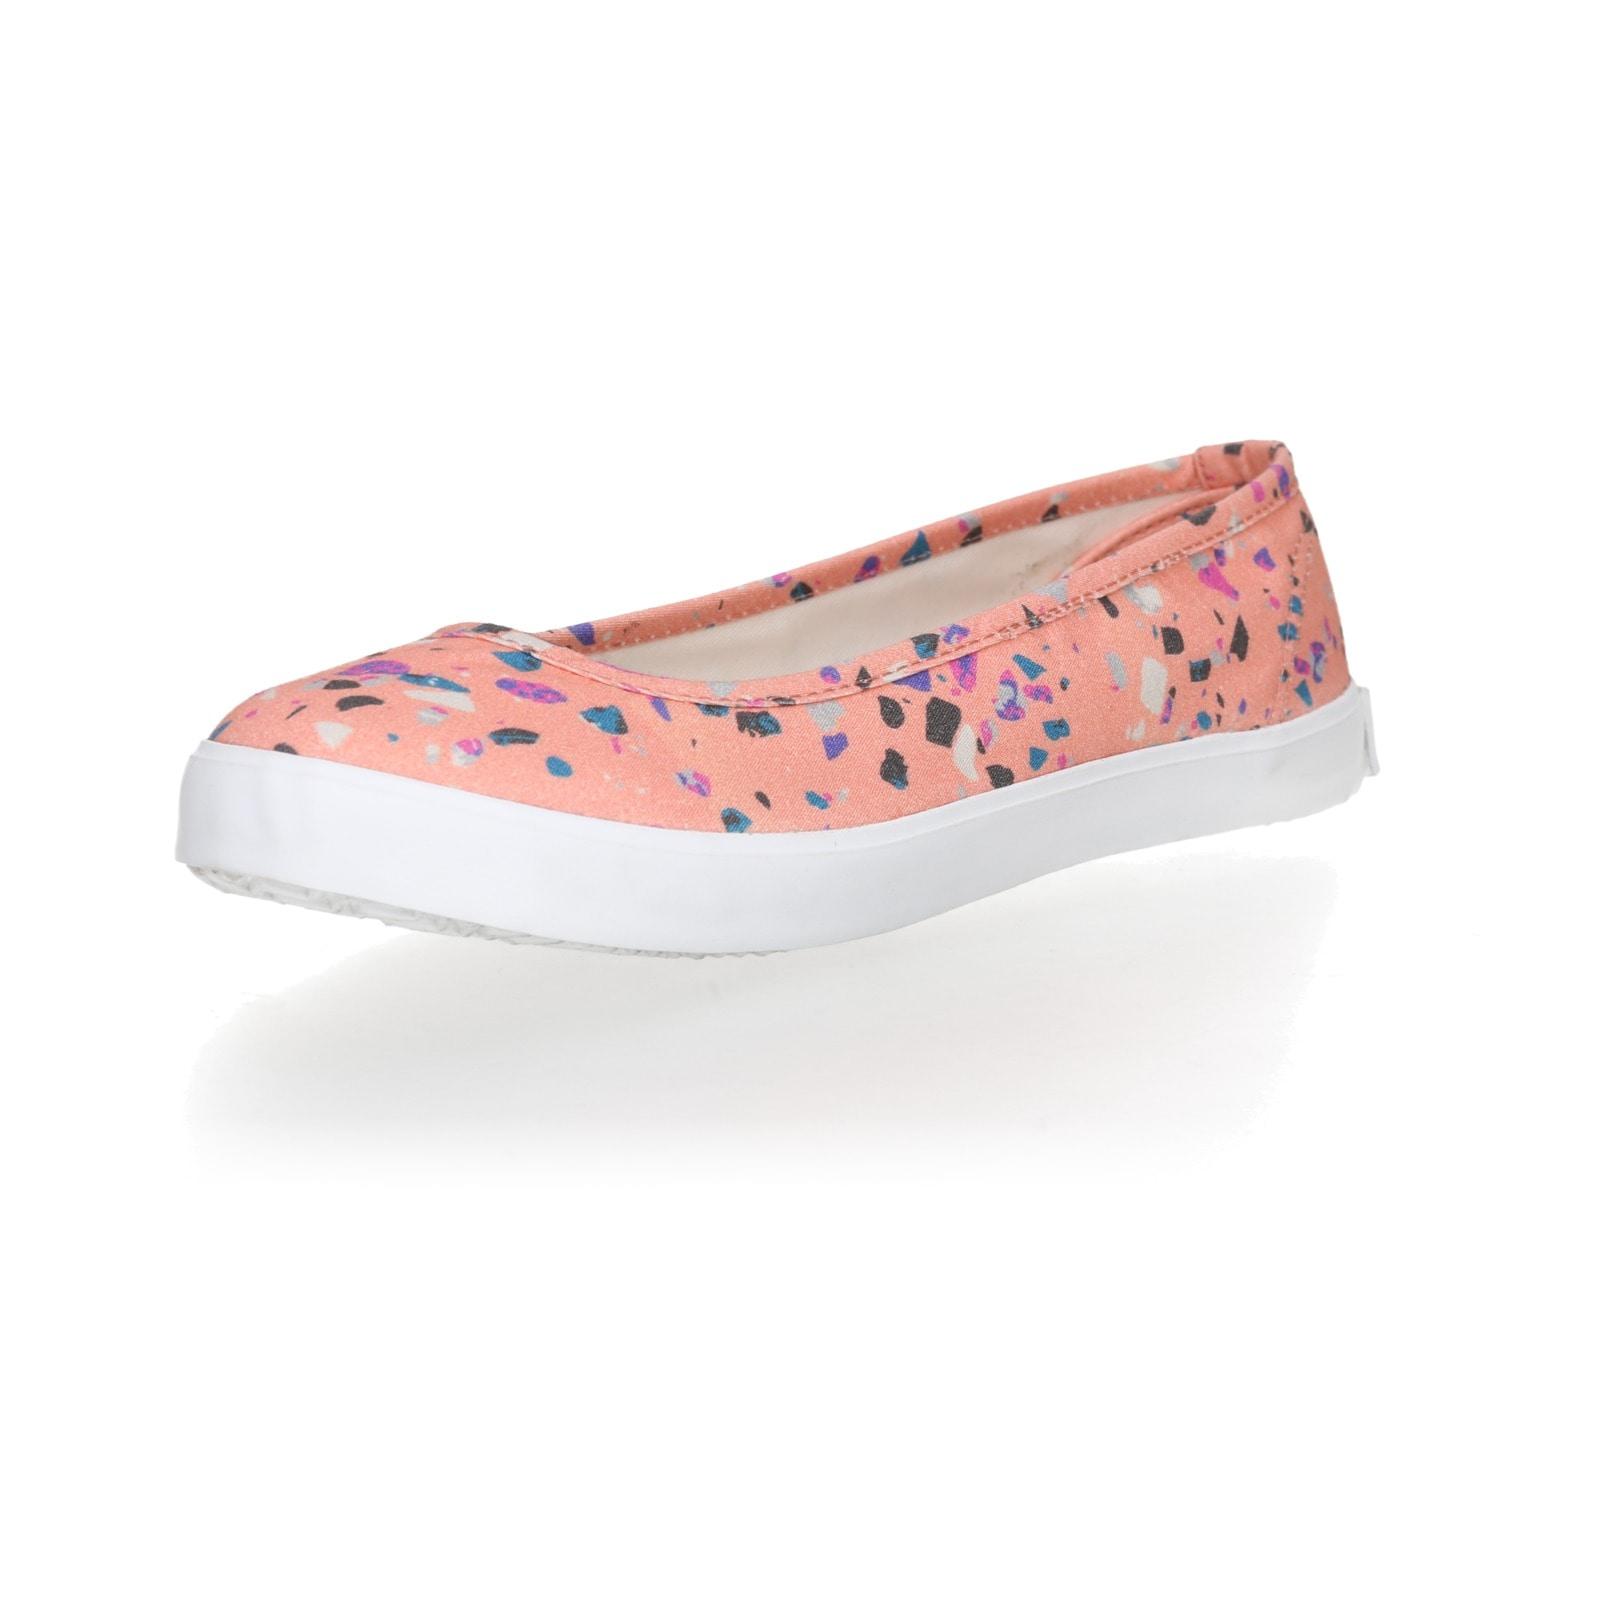 ethletic -  Sneaker aus fairer Produktion Collection 18